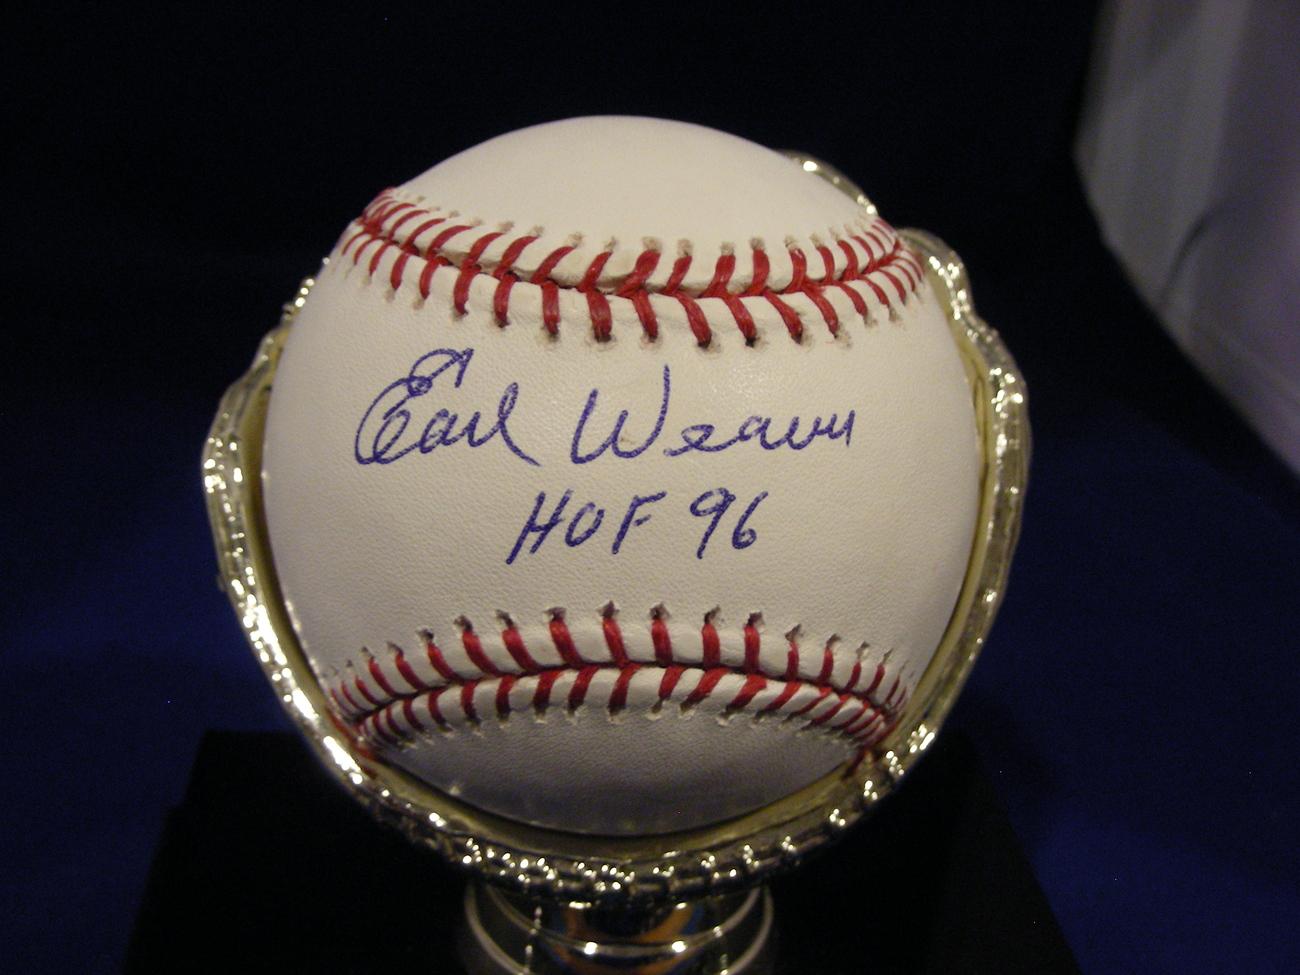 1 26 12 baseballs psa jsa 037